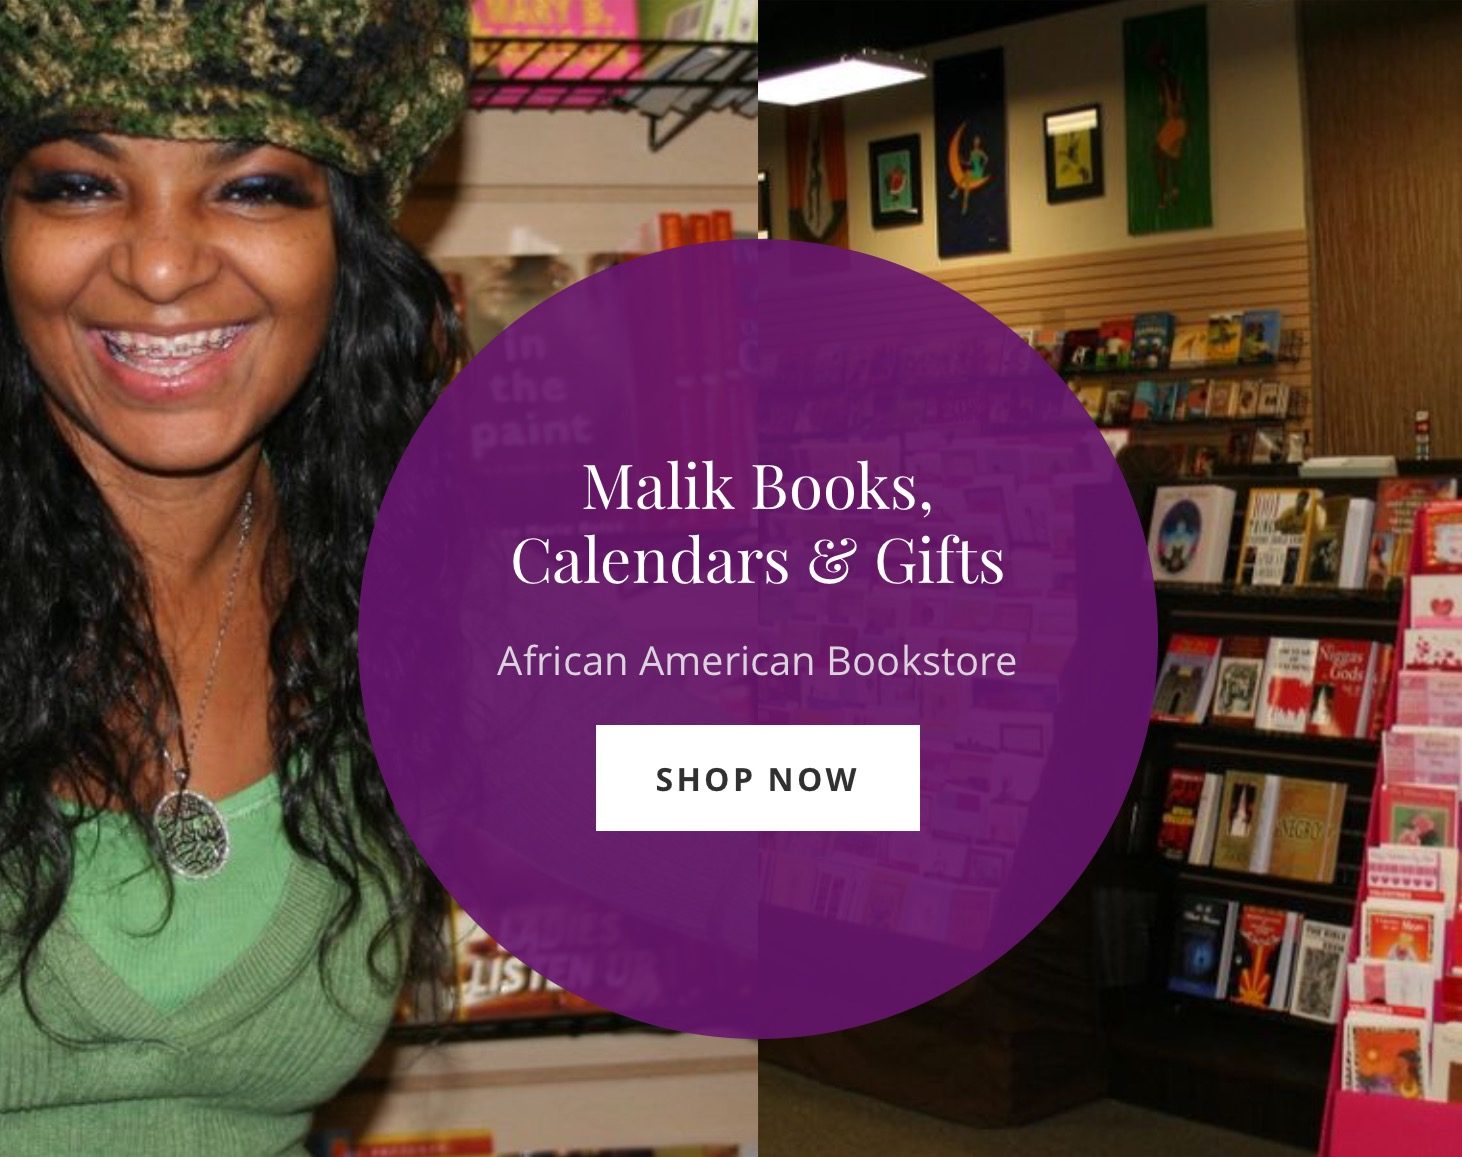 Malik Books (Book store)